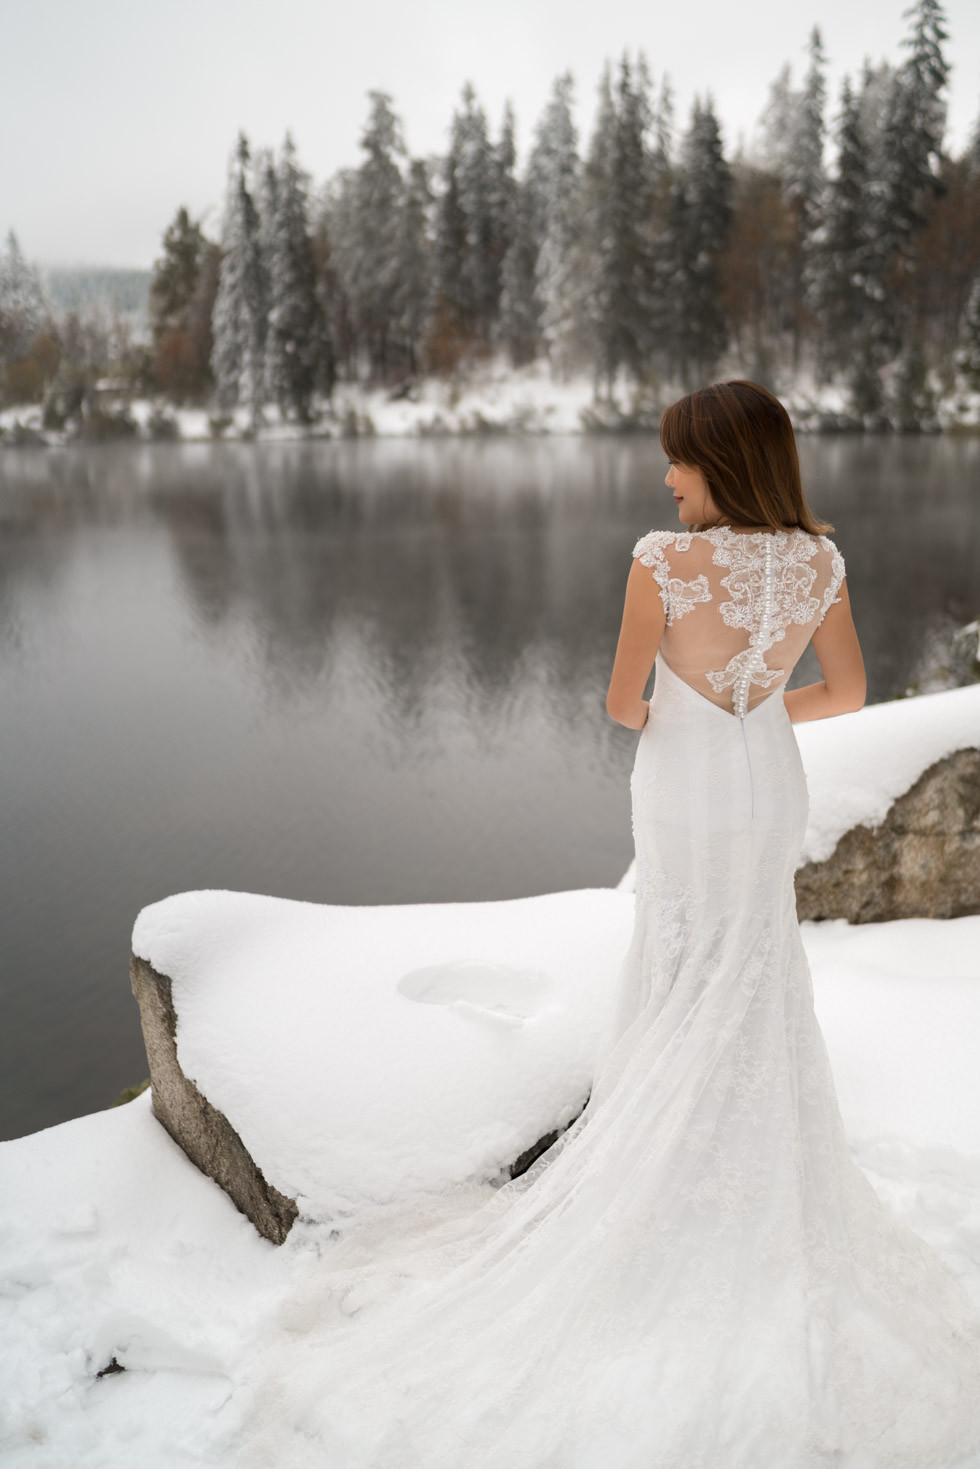 Snow White 718am Wedding Photography-005